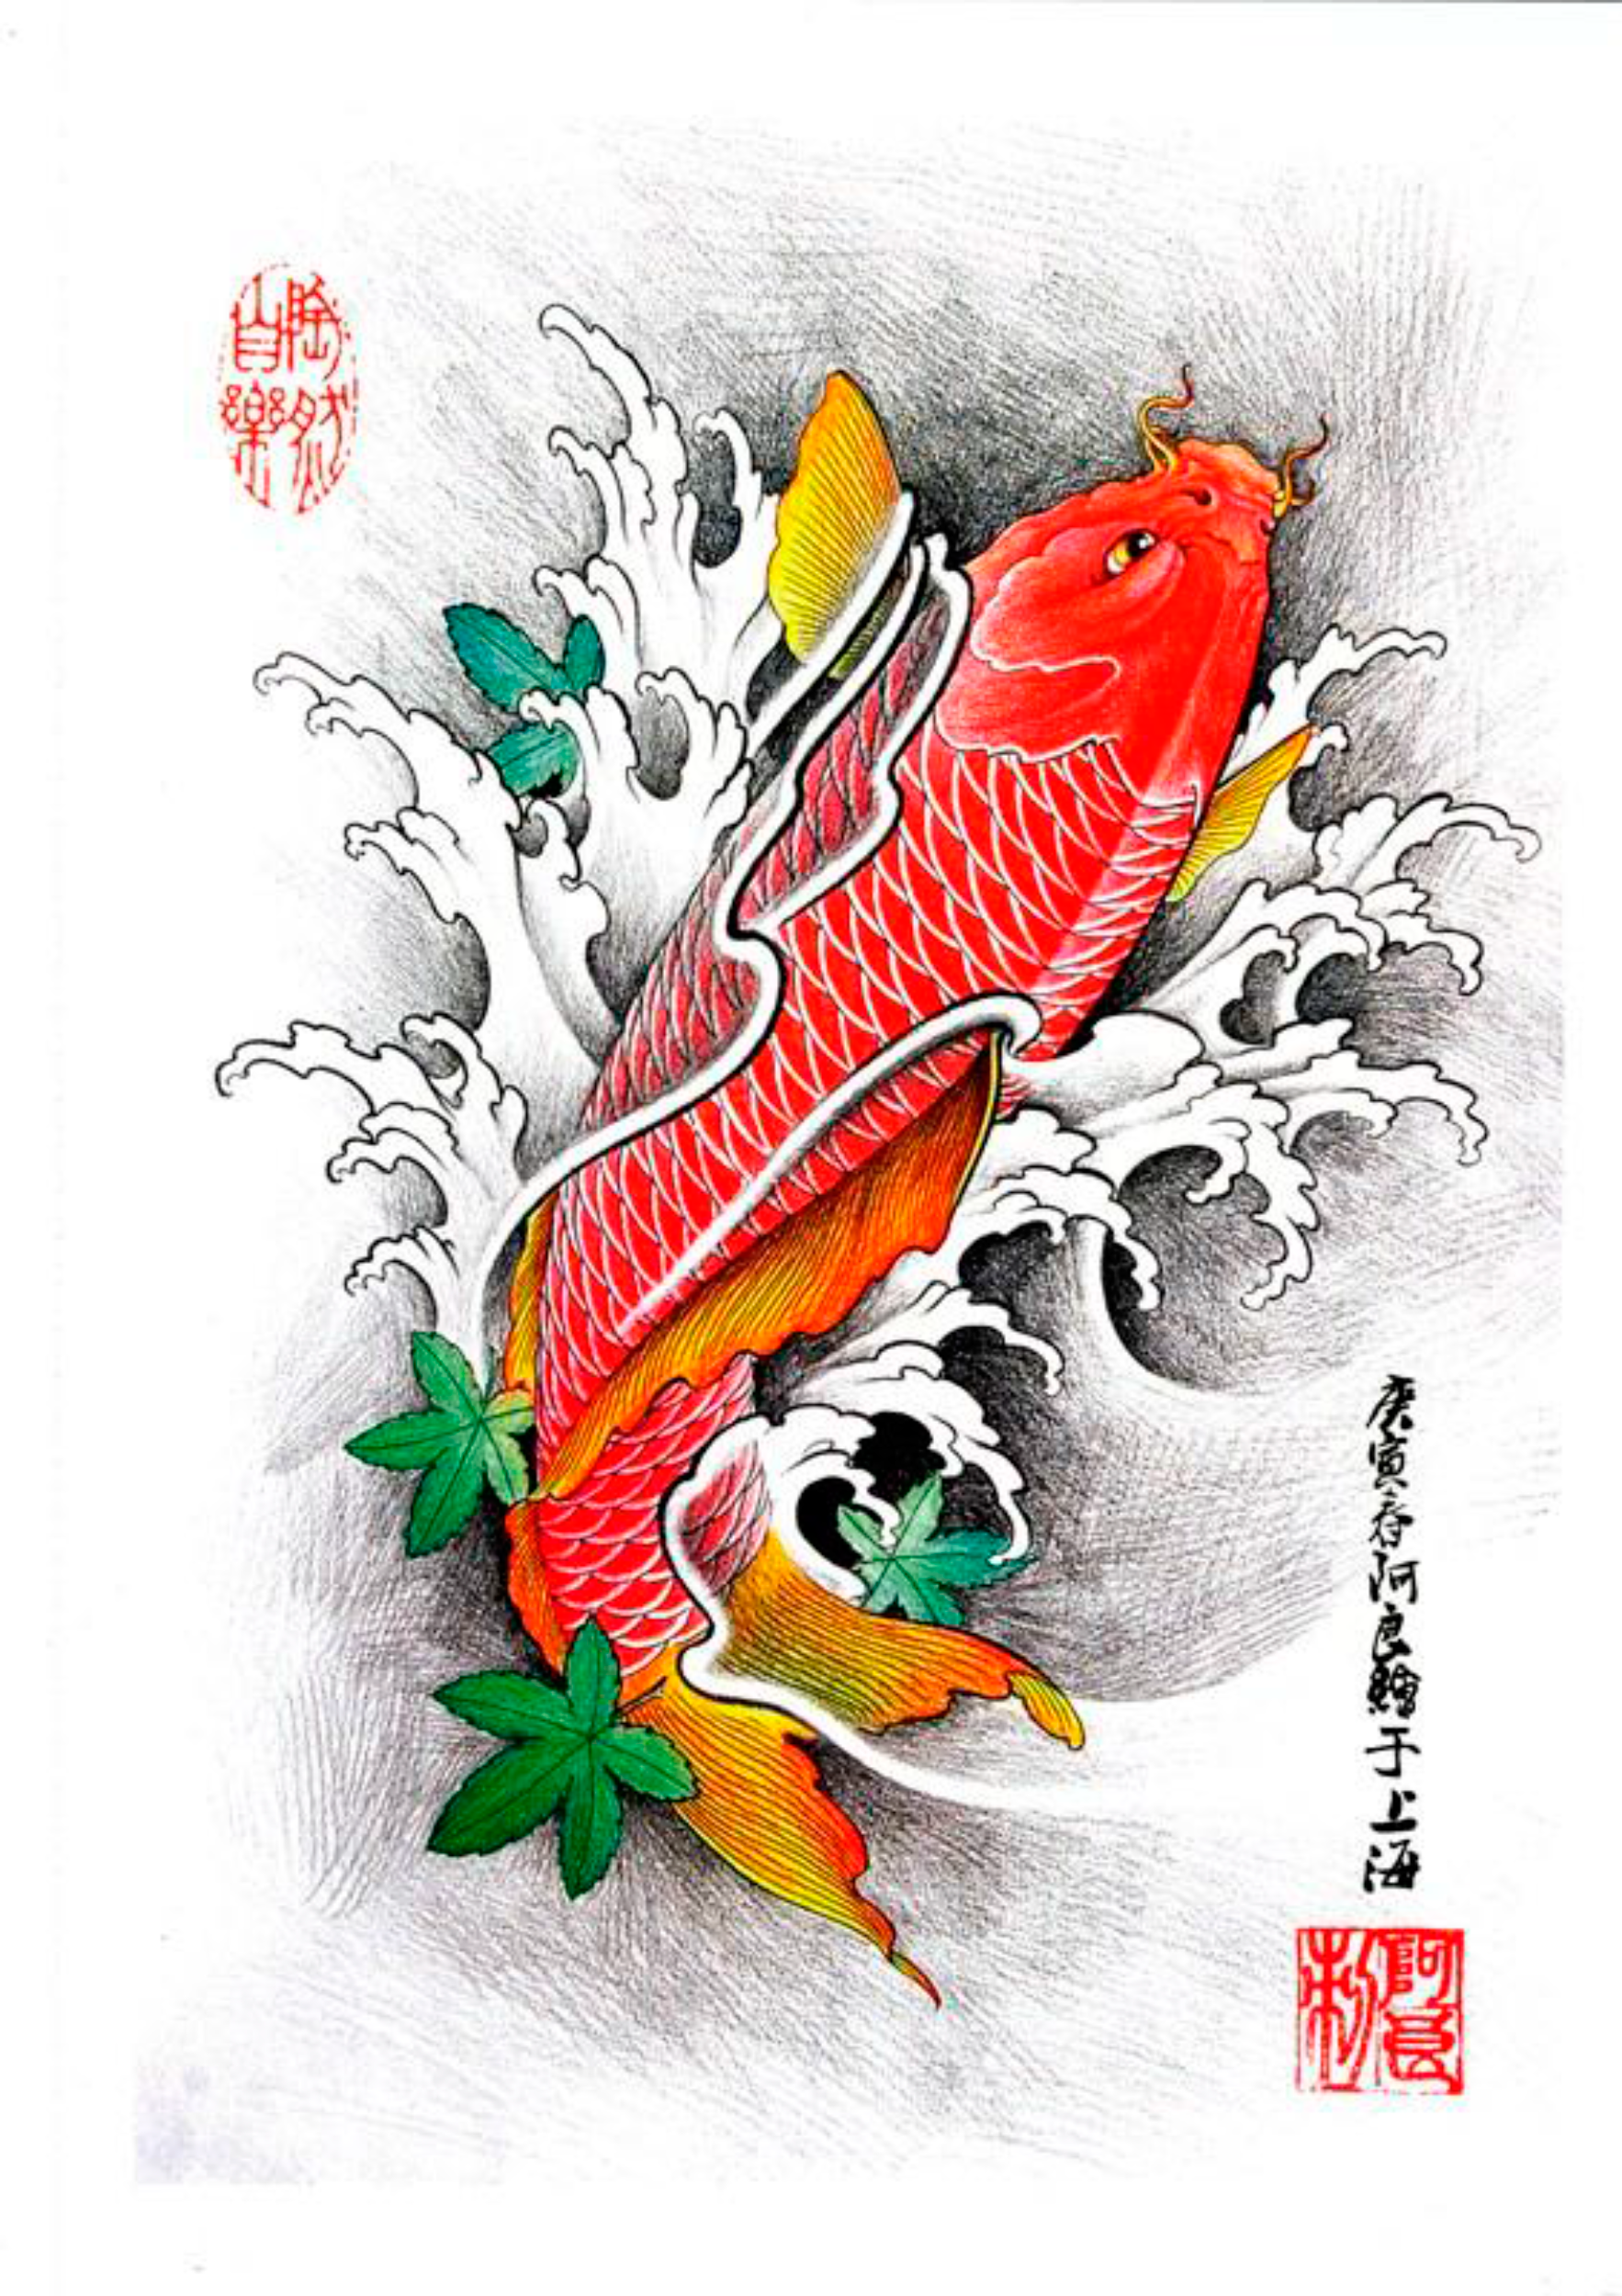 Pin by Lioubov on Fish art | Pinterest | Koi tattoo design, Tattoo ...